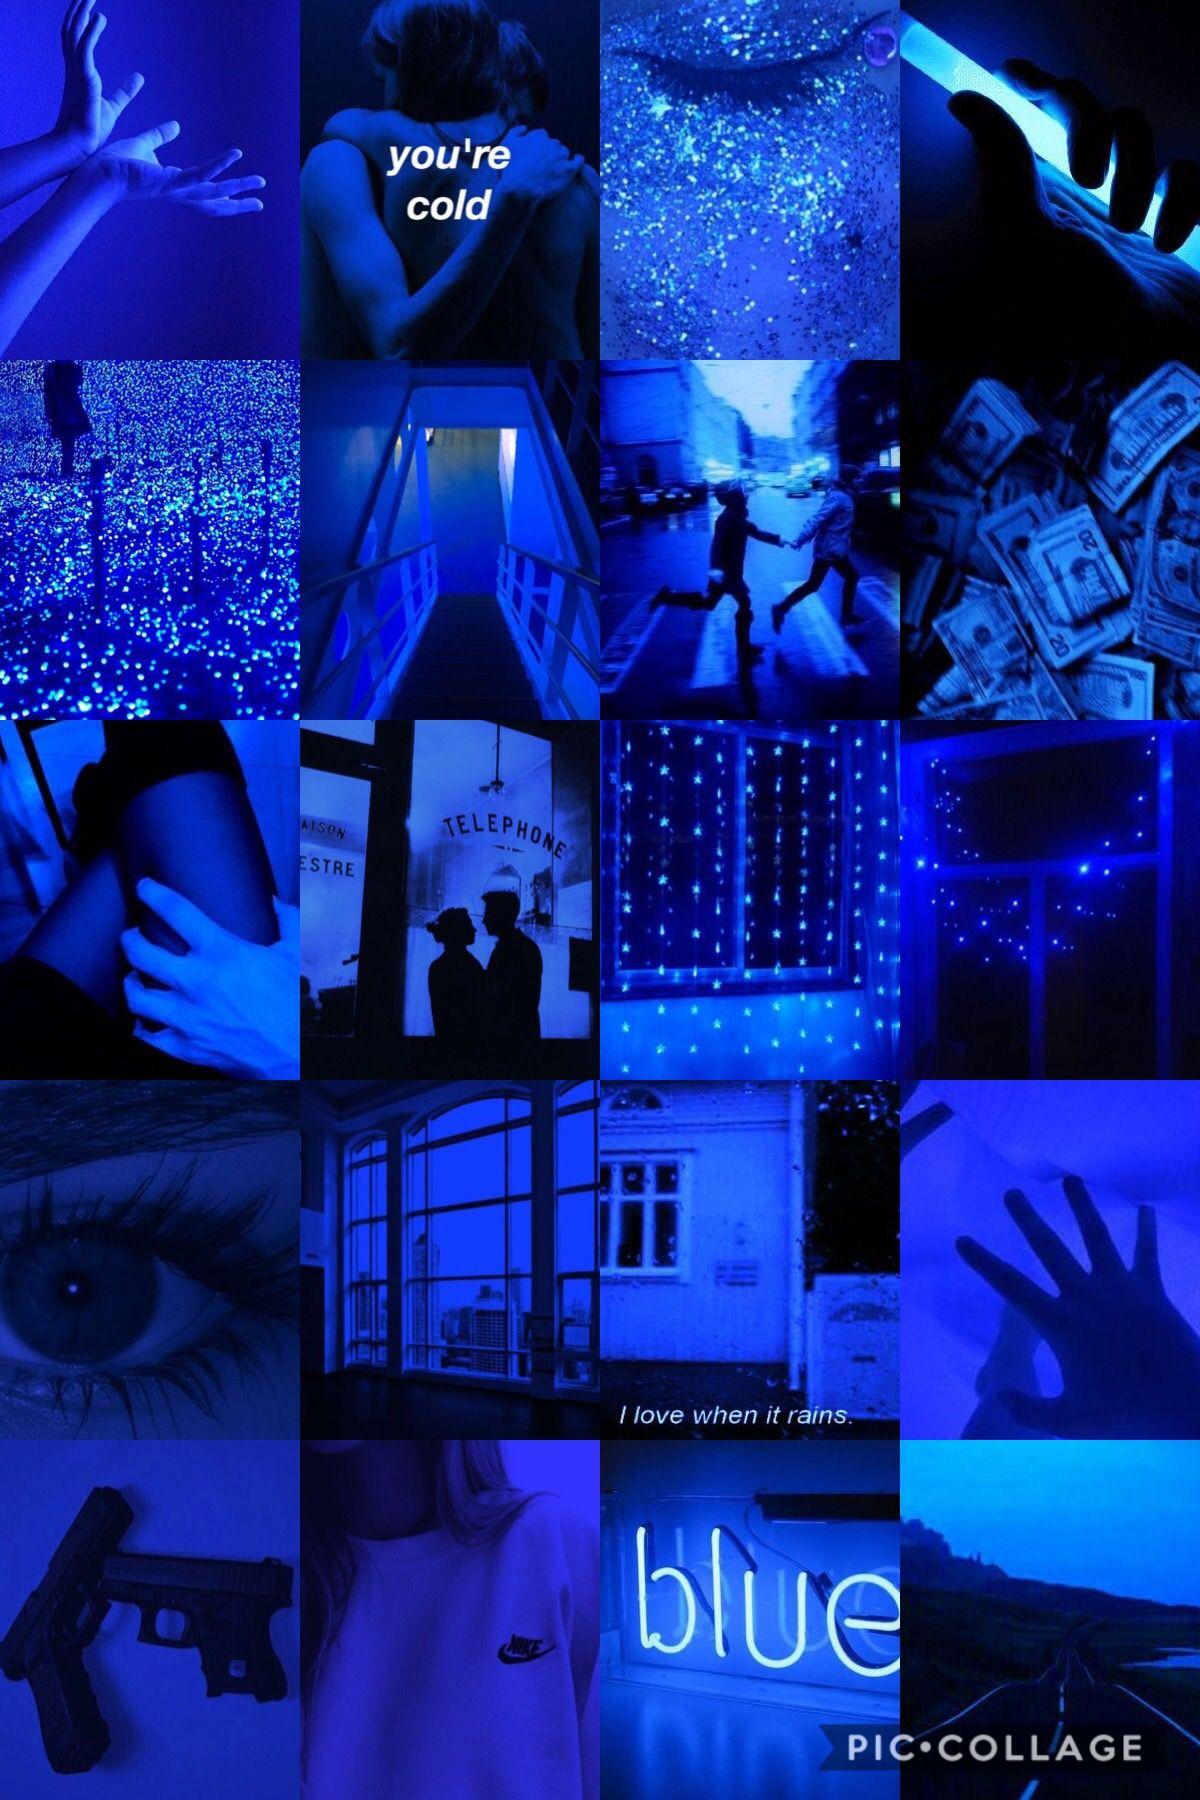 Iphone Neon Blue Aesthetic Wallpaper